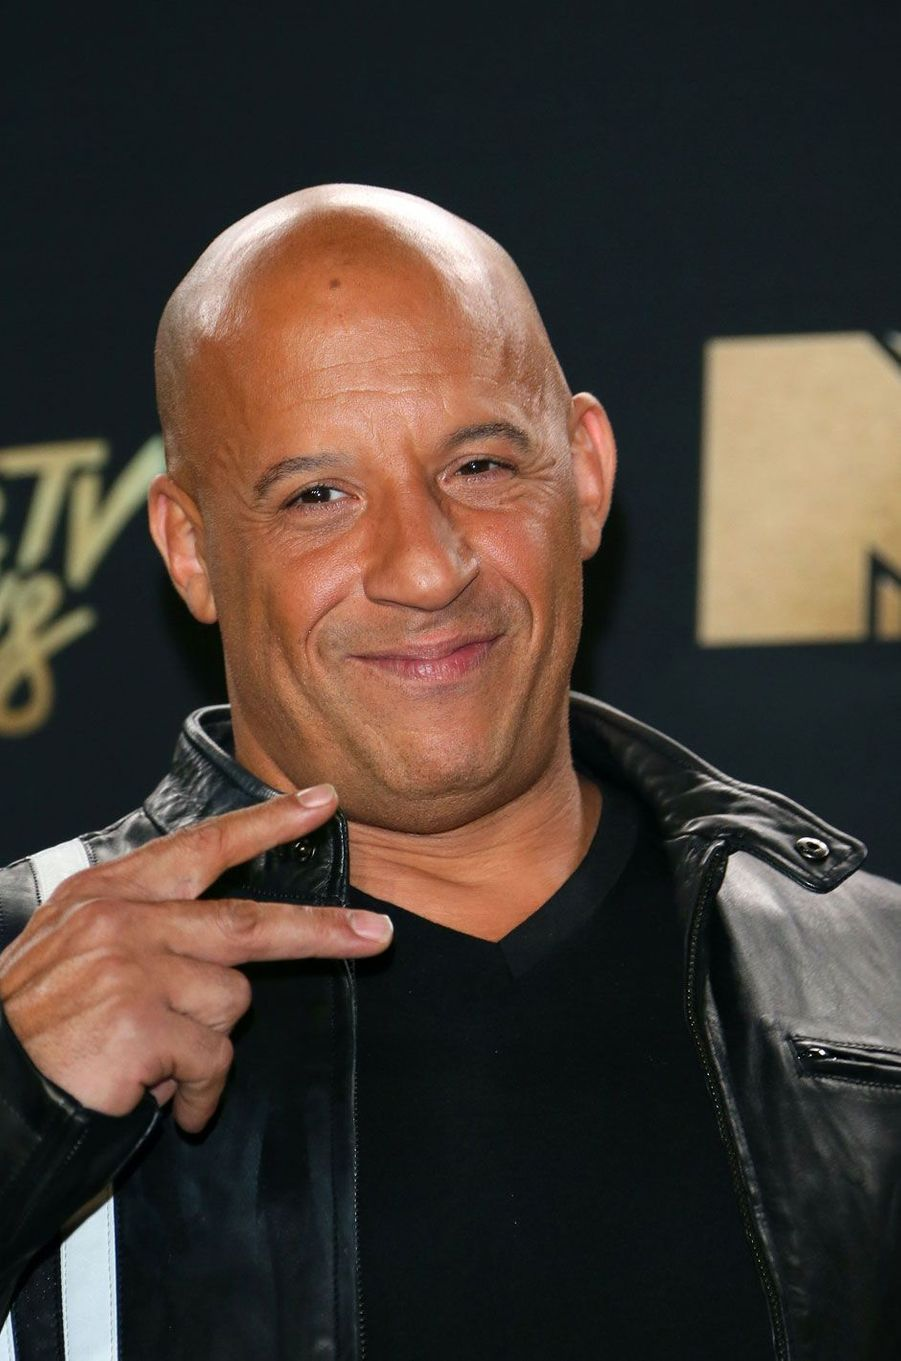 Vin Diesel, 54,5 millions de dollars